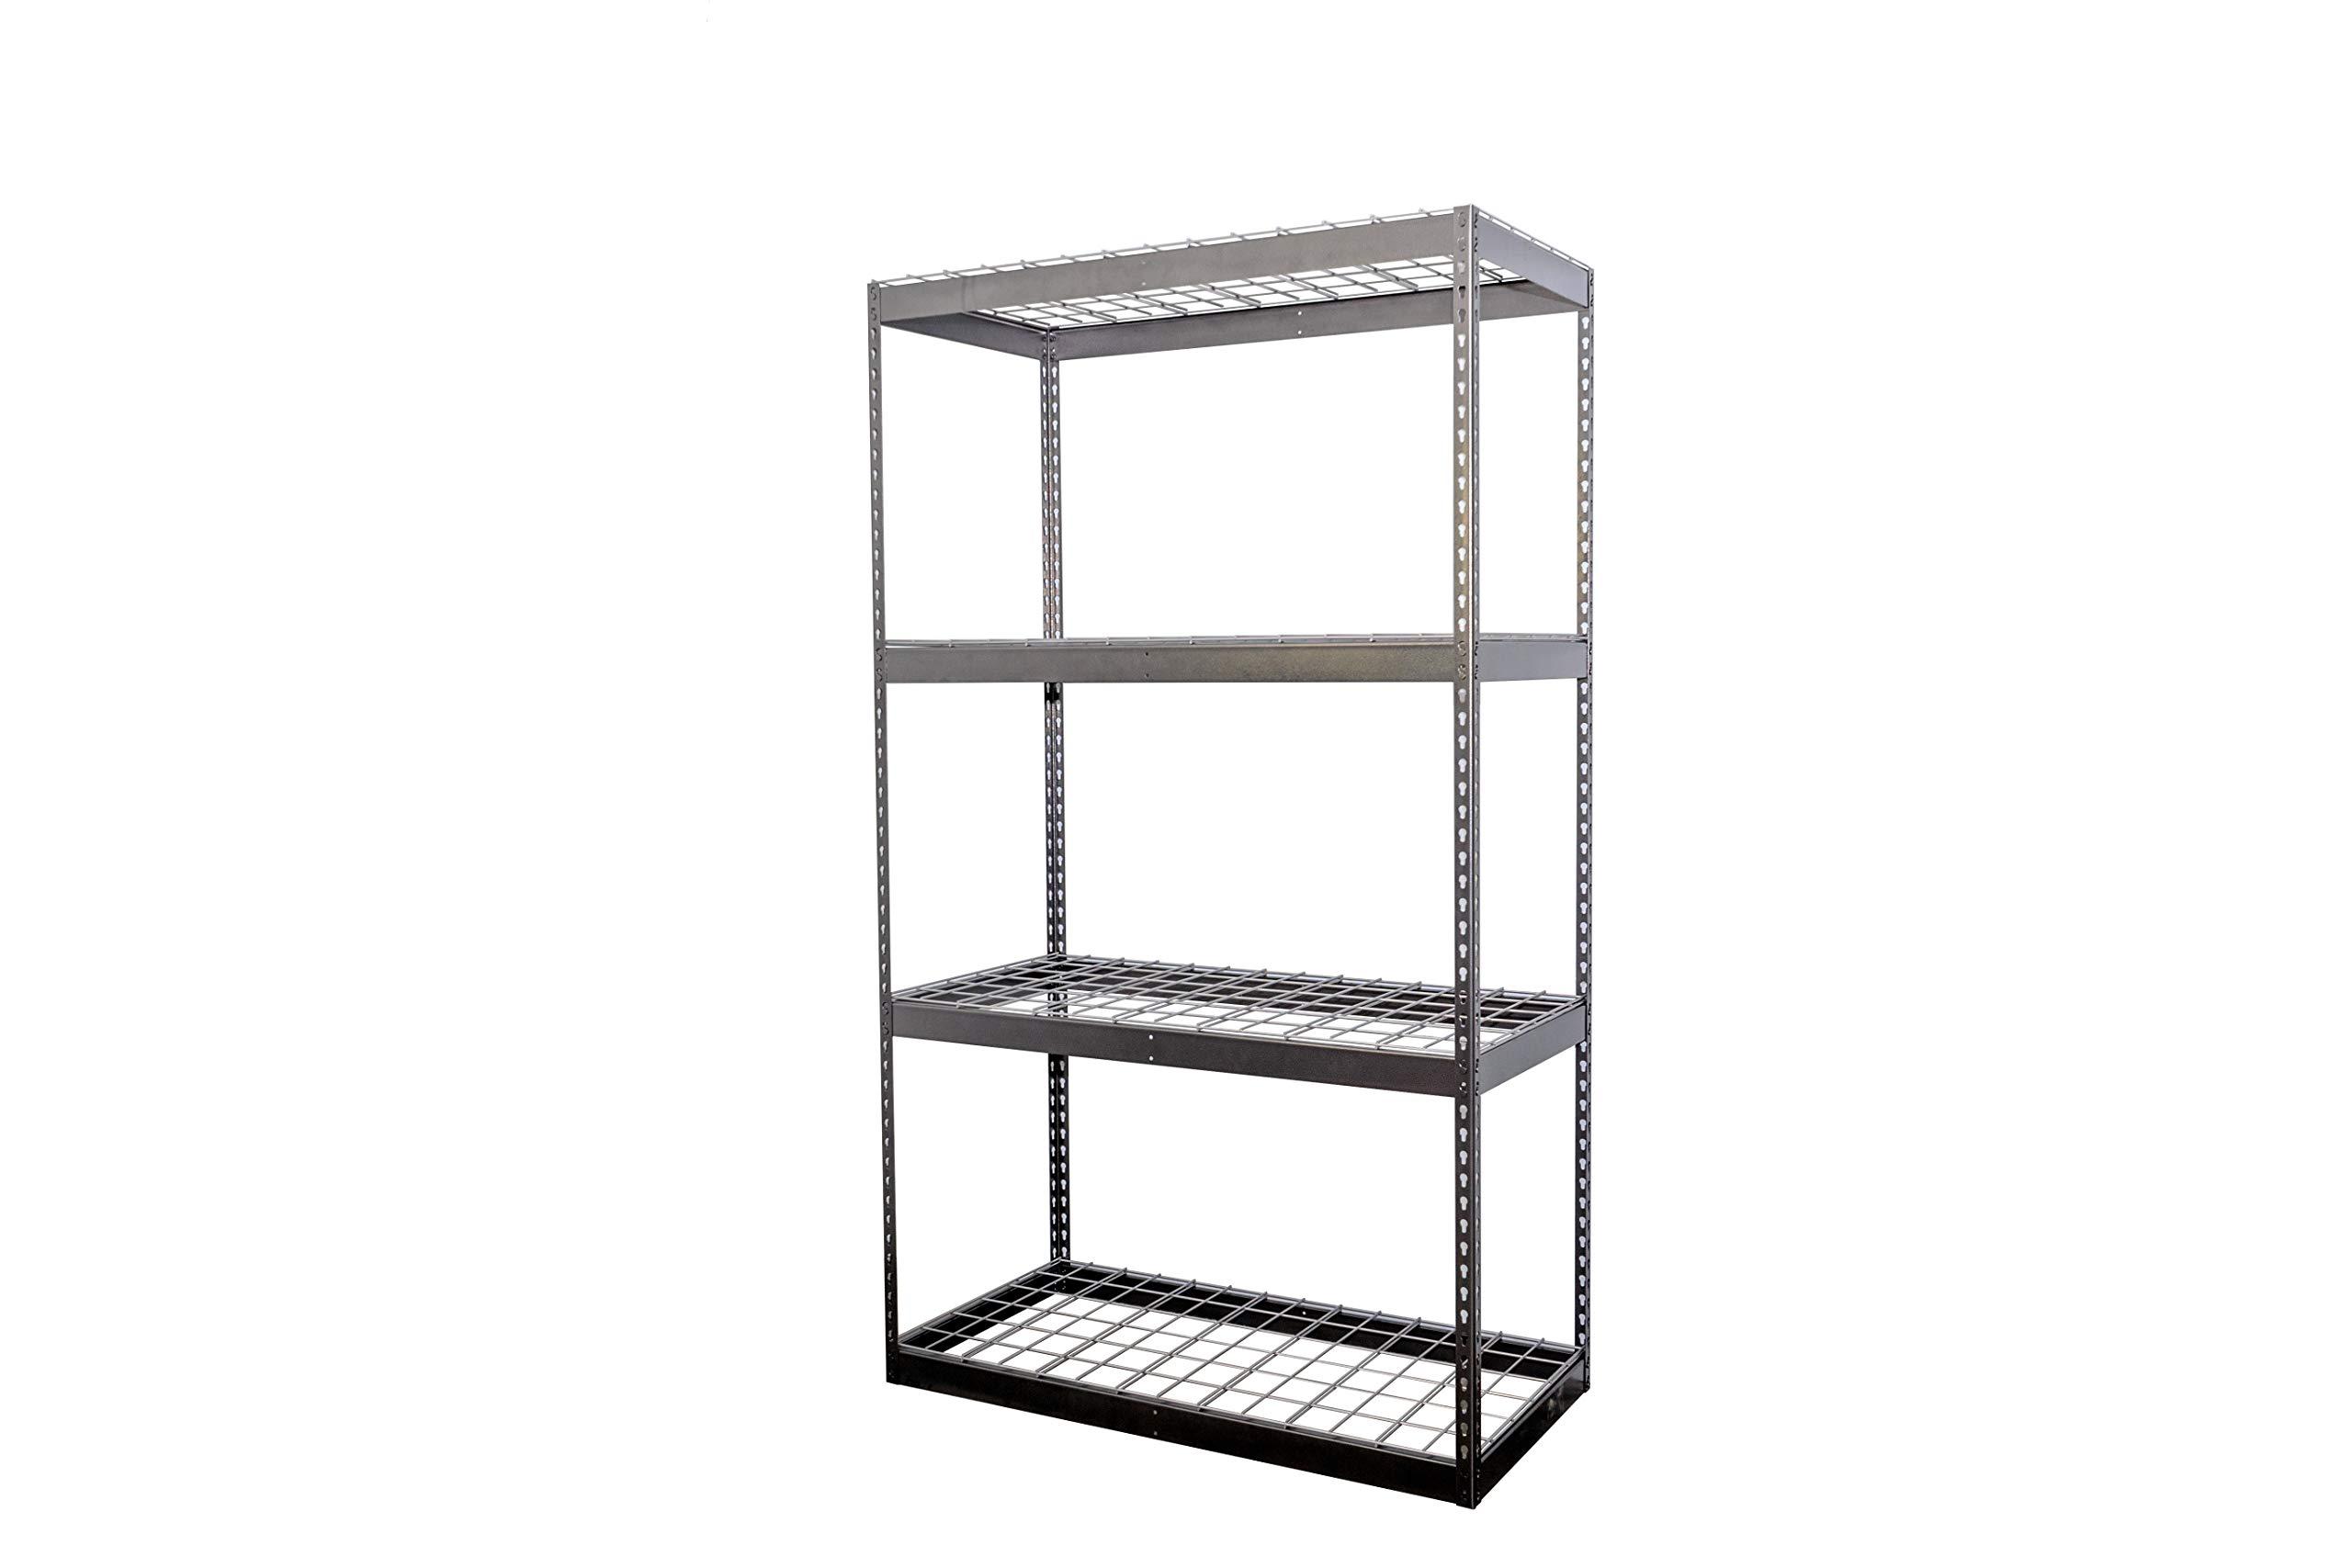 SafeRacks Garage Storage Rack - Hammertone | Steel Shelving Unit | 2'D x 4'W x 7'T by SafeRacks